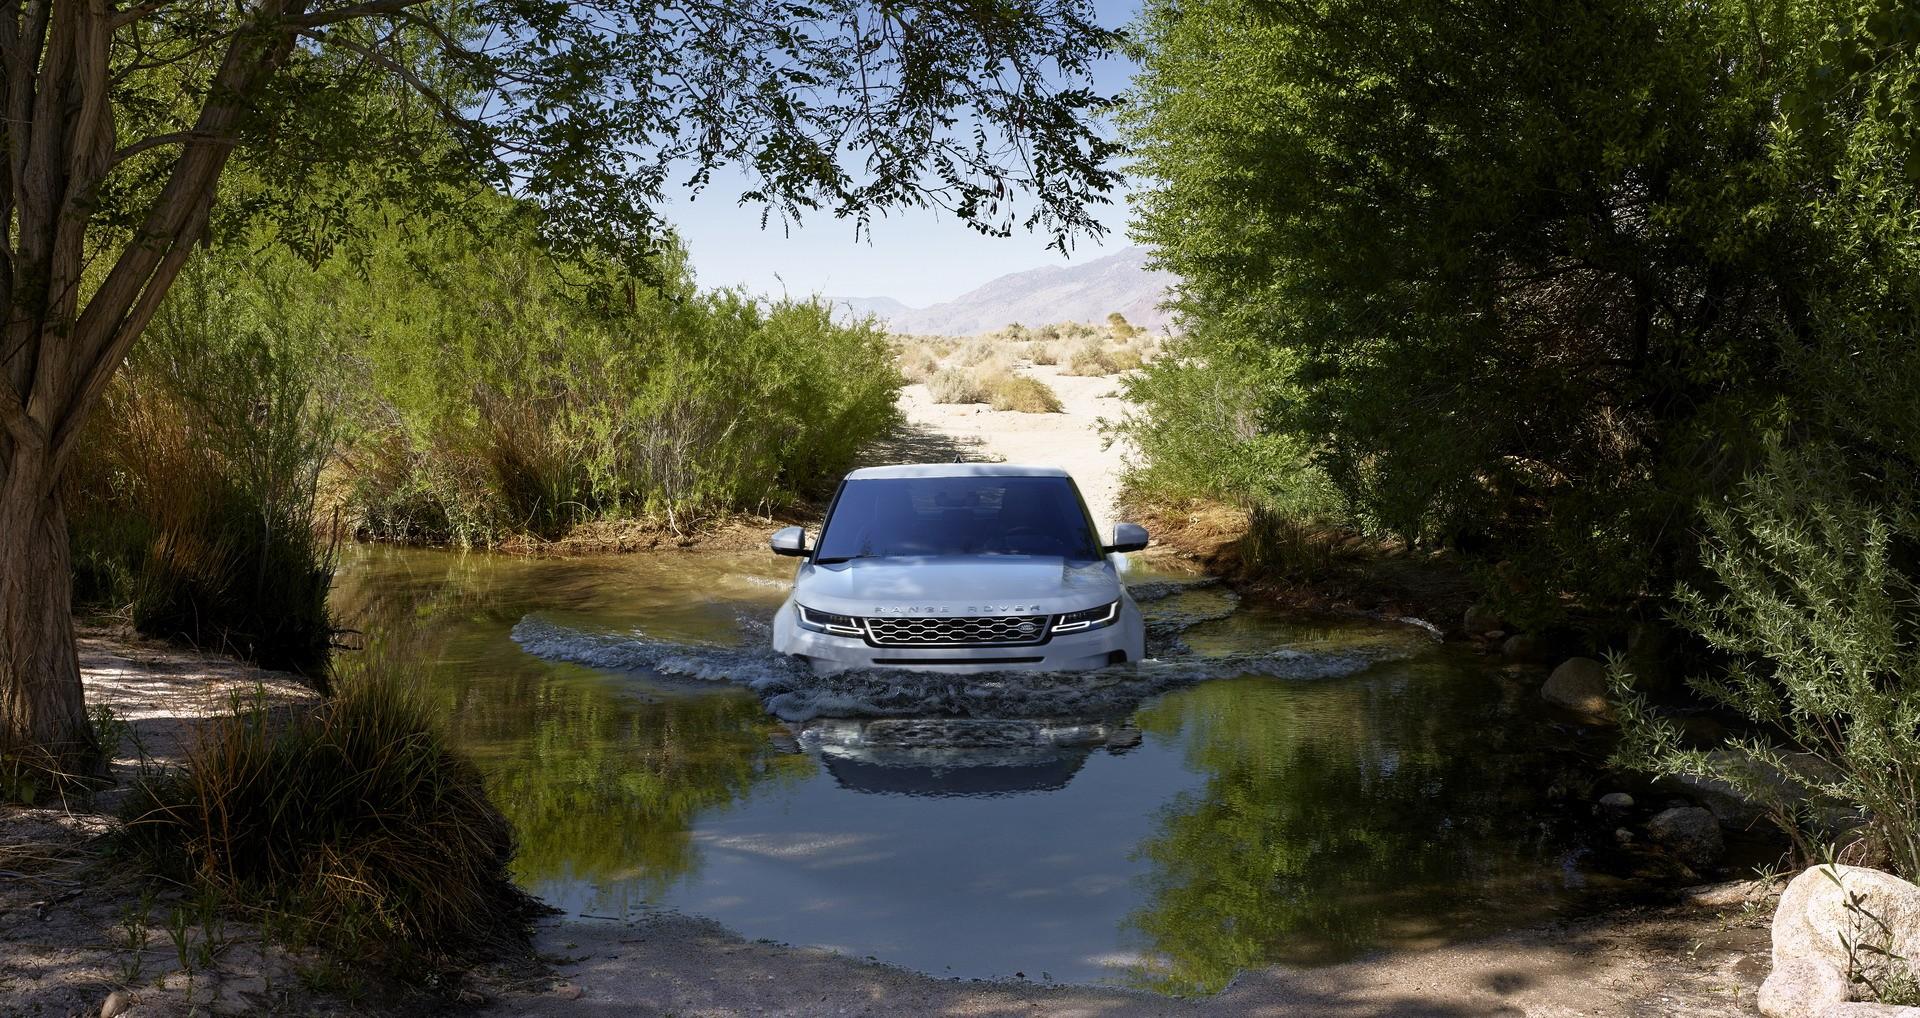 Range Rover Evoque EV Not Happening Anytime Soon, Plug-In Hybrid